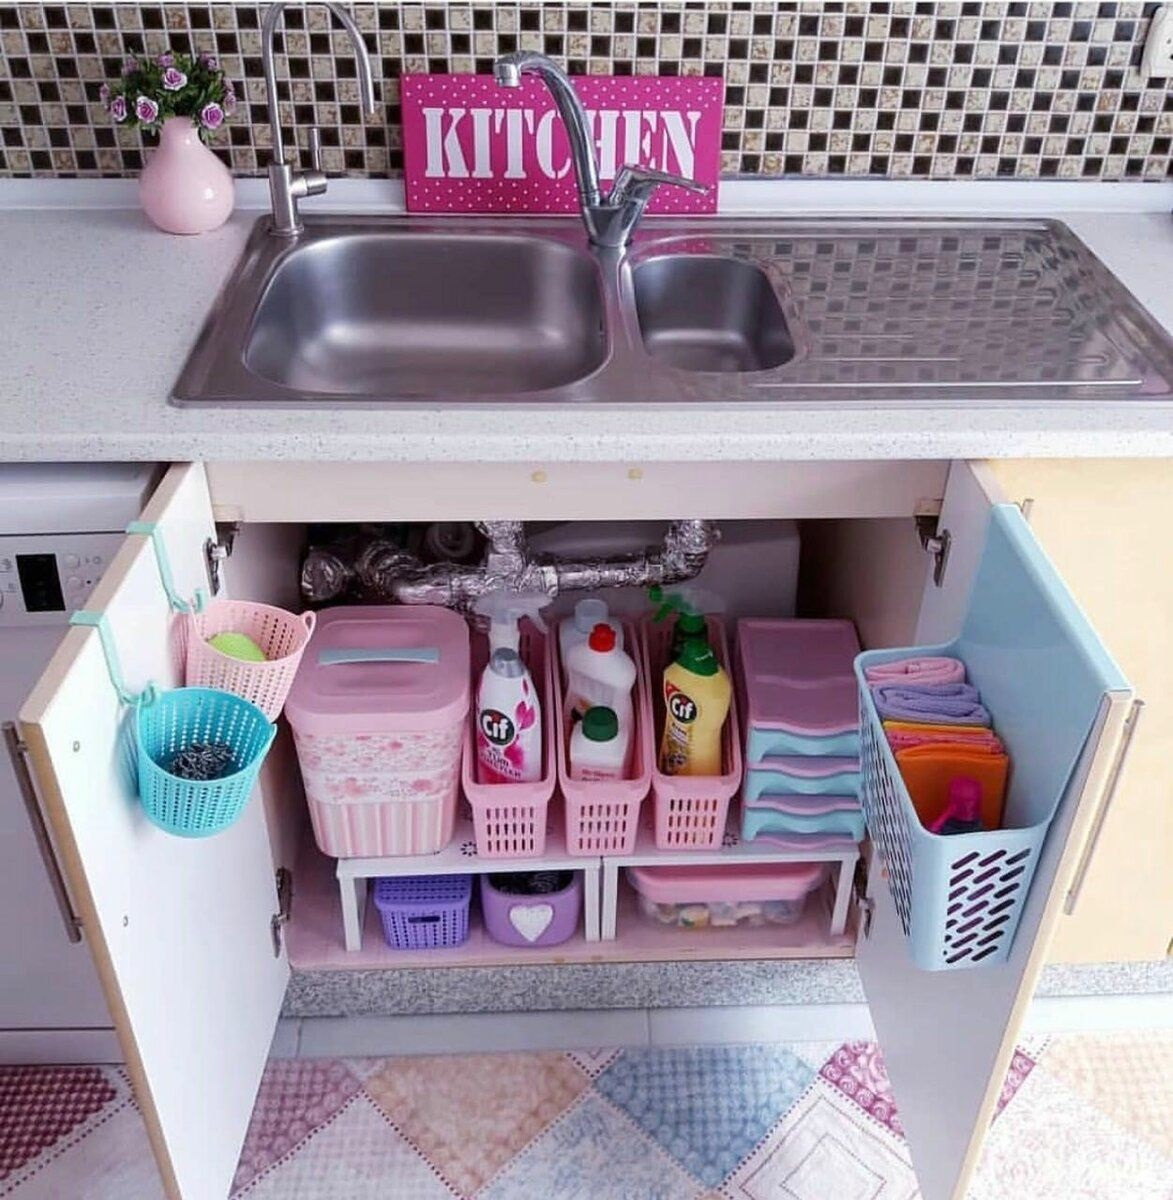 шкаф под мойку для хранения средств